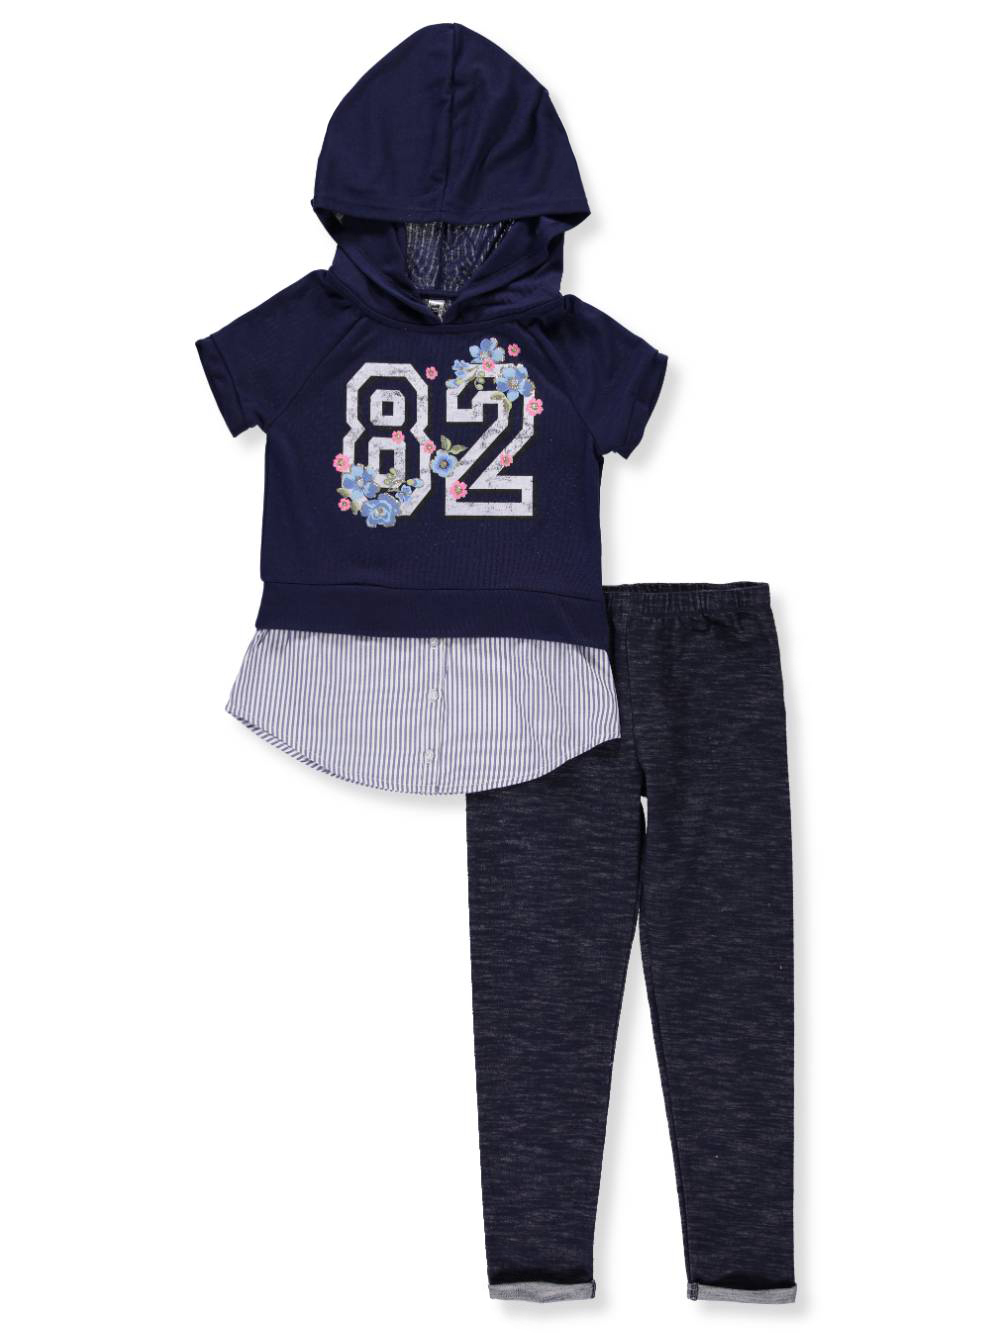 d7575c8444a1a Beautees Girls' 2-Piece Leggings Set Outfit